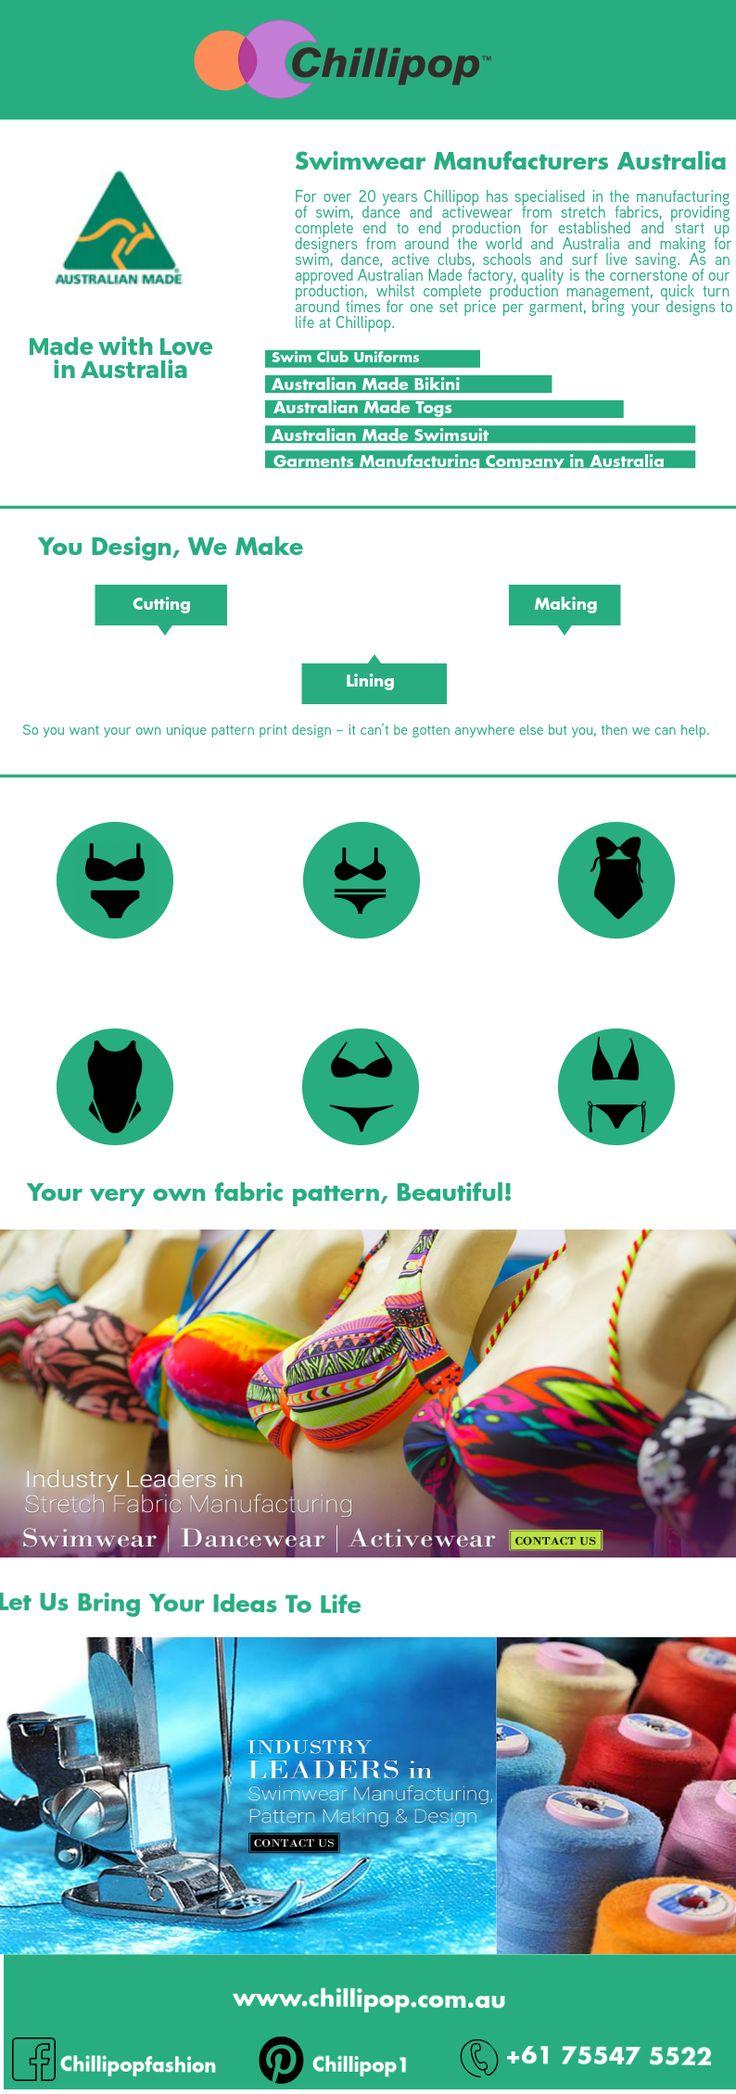 #Swim_Club_Uniforms #Complete_Production_Packages  #Australian_Made_Bikini #Australian_Made_Swimwear #Garments_Manufacturing_Companies_in_Australia